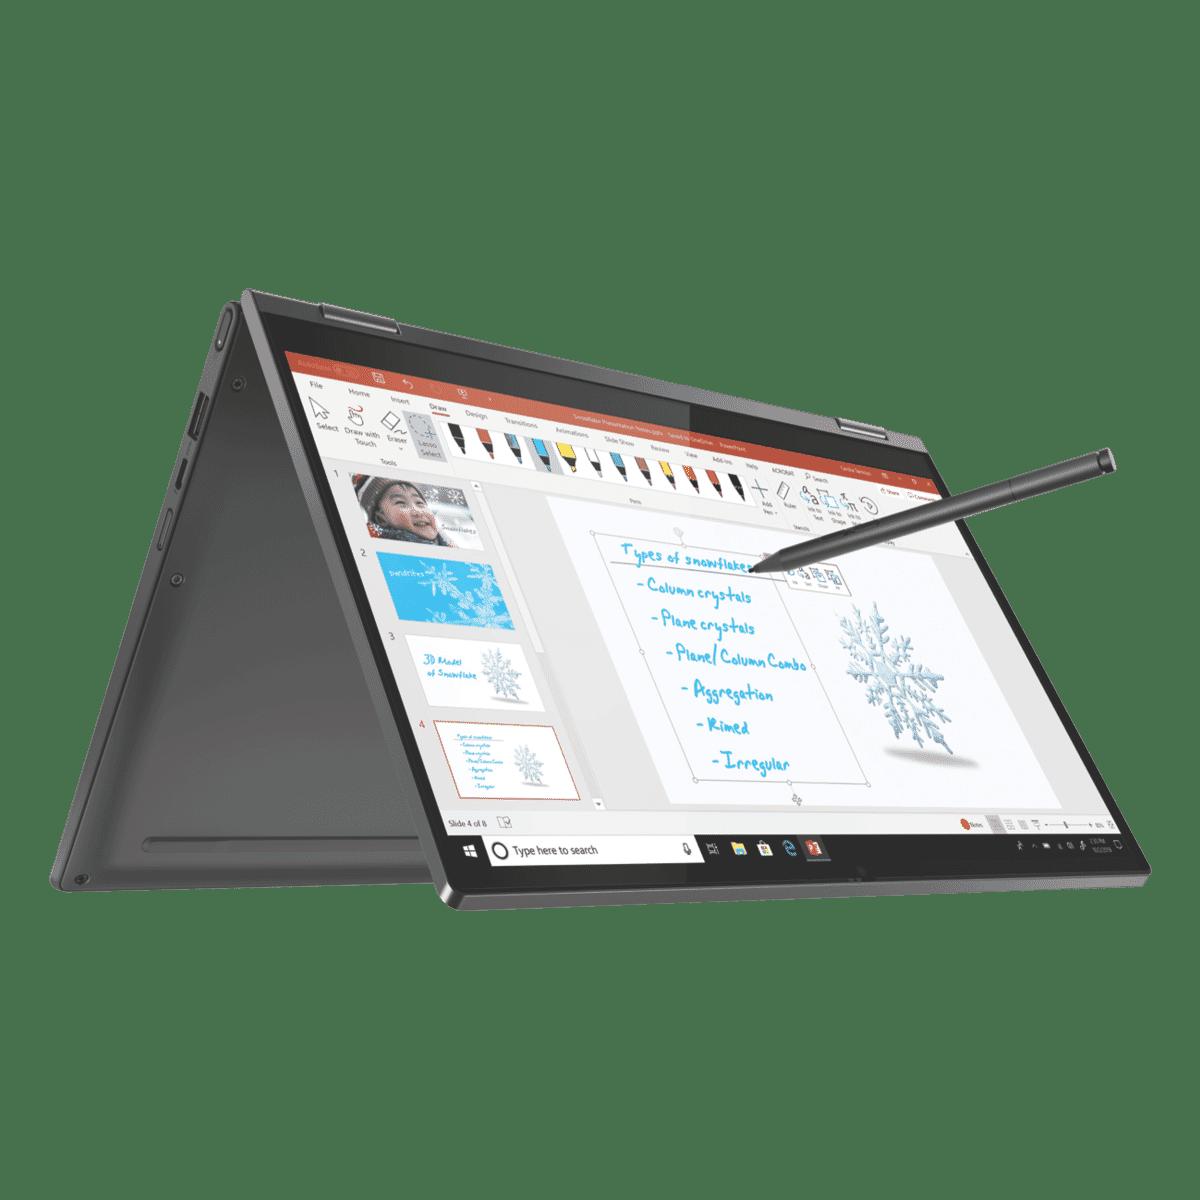 Lenovo 81xl0005au Yoga C640 Lte 13 I5 8gb 256gb Ssd 2 In 1 Laptop At The Good Guys